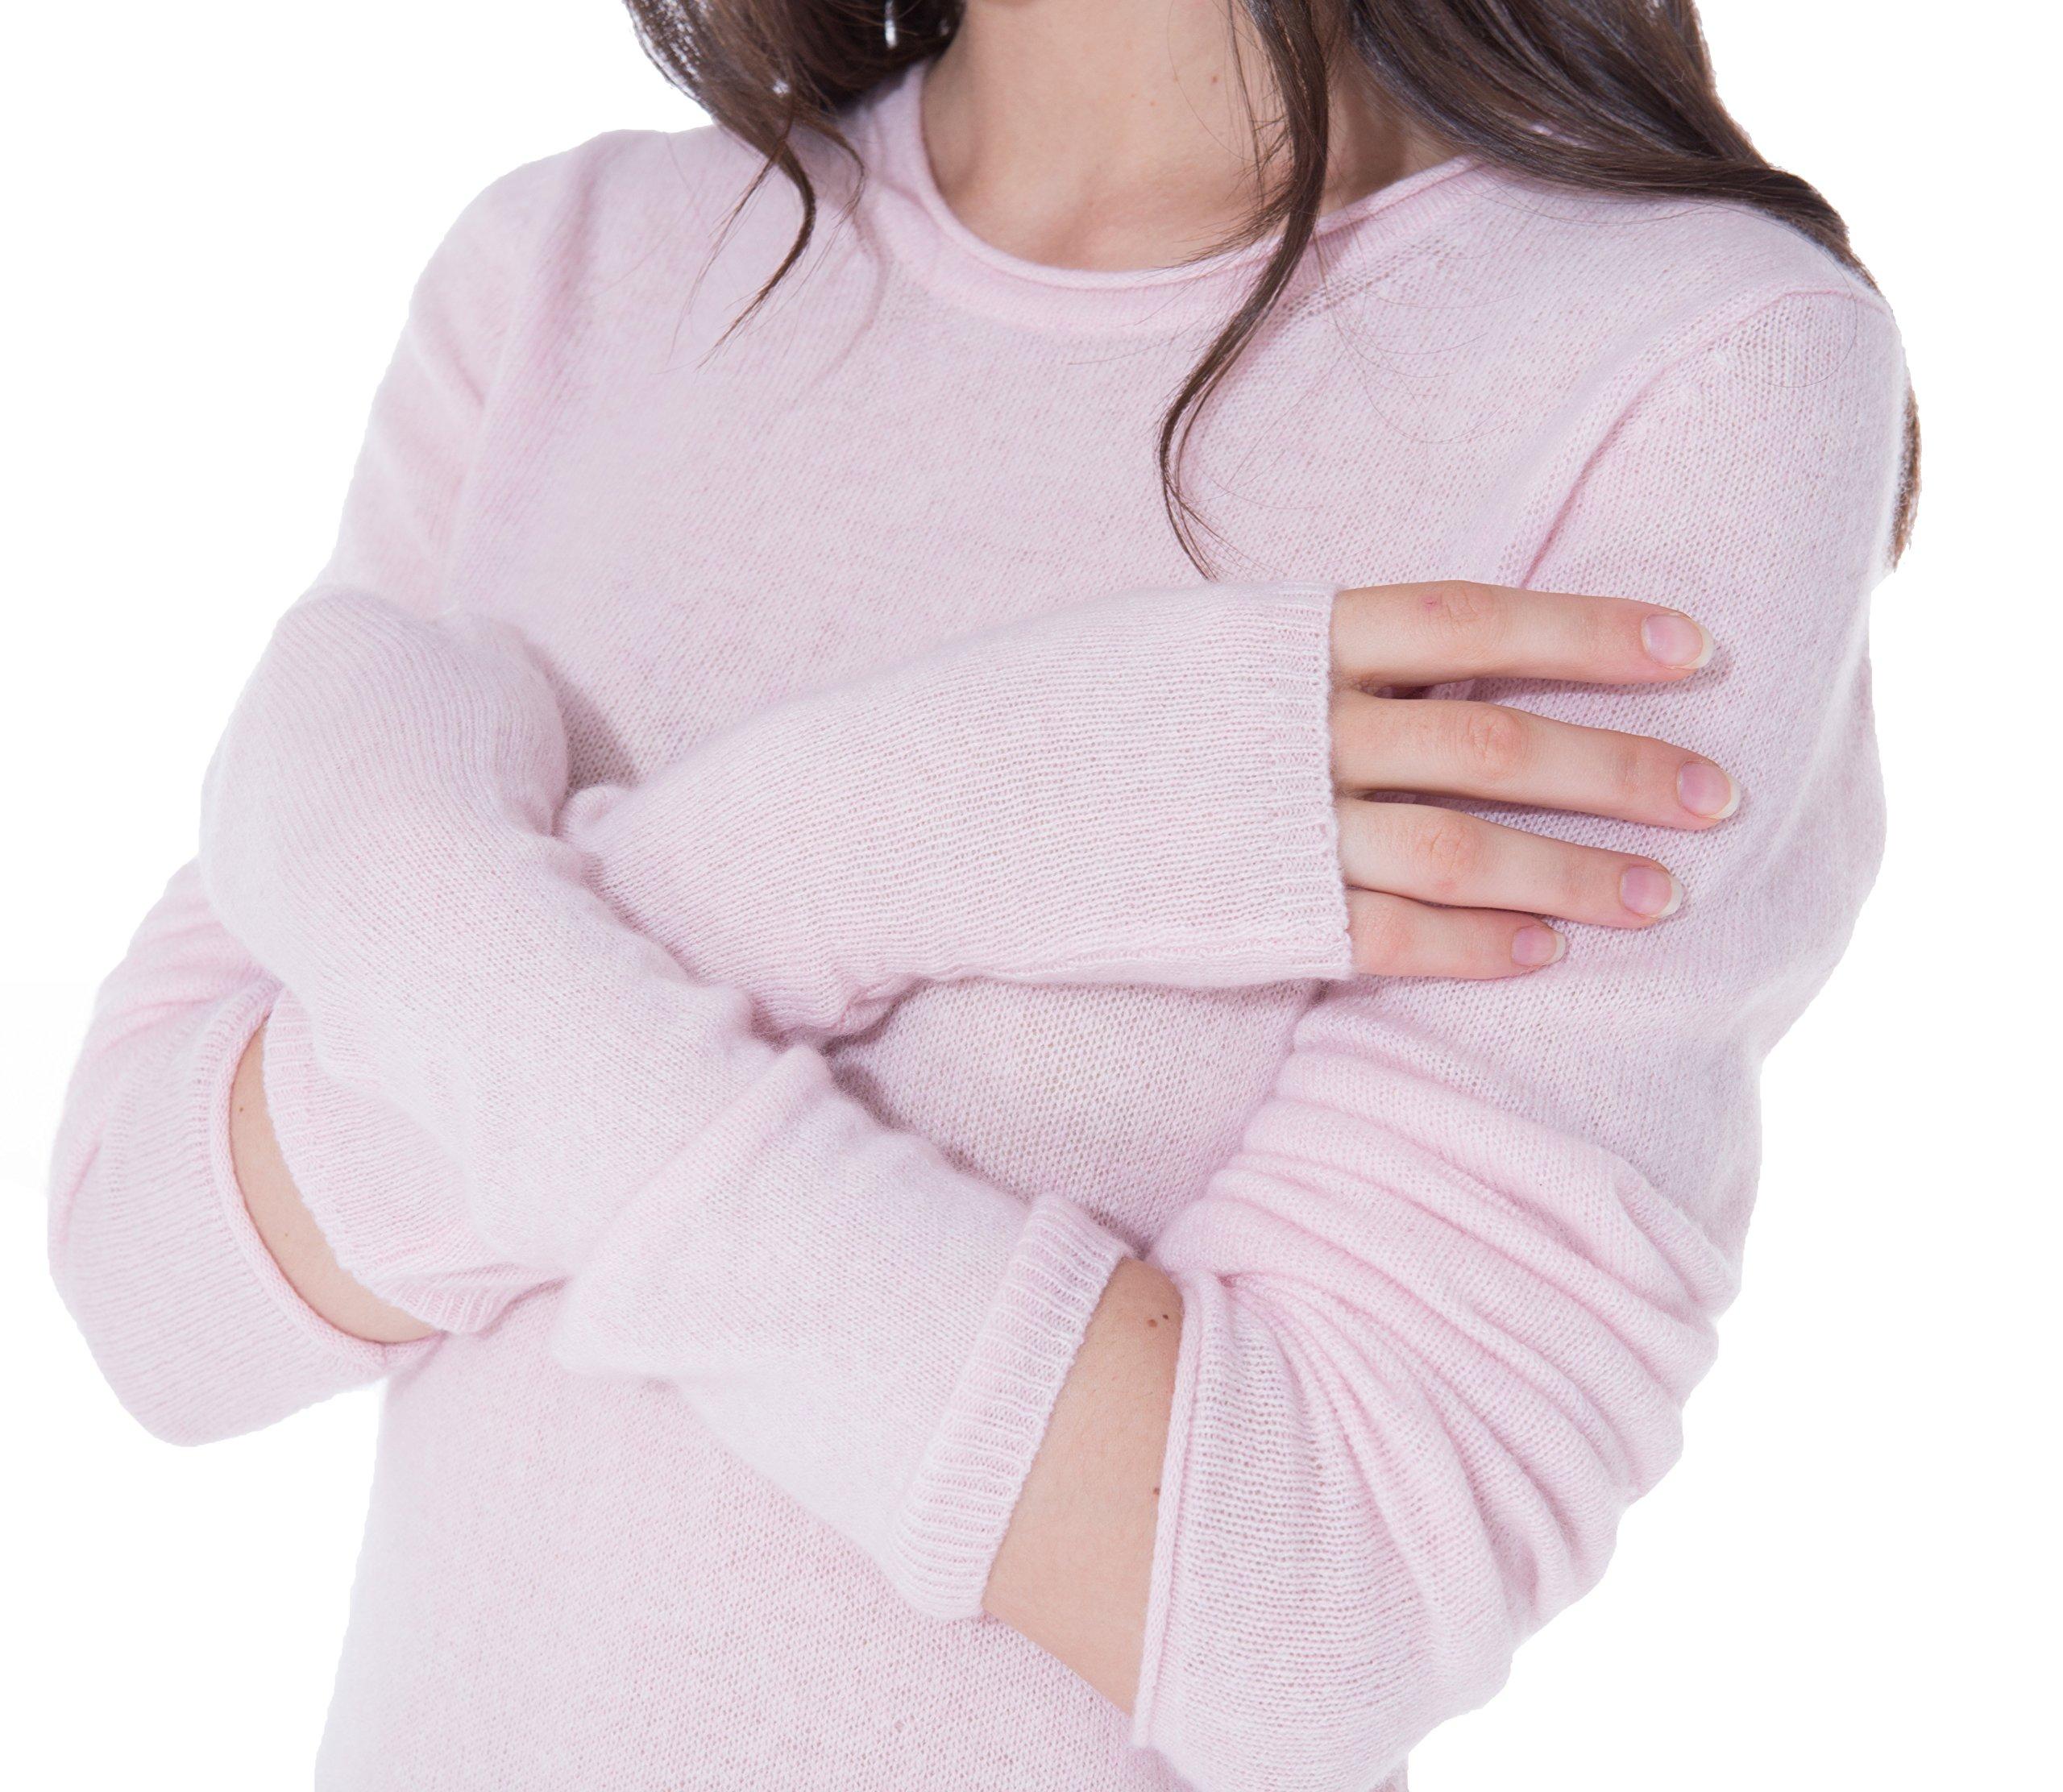 cashmere 4 U Women's 100% Cashmere Long Sleeve Fingerless Mitten Gloves (Givre) by cashmere 4 U (Image #3)